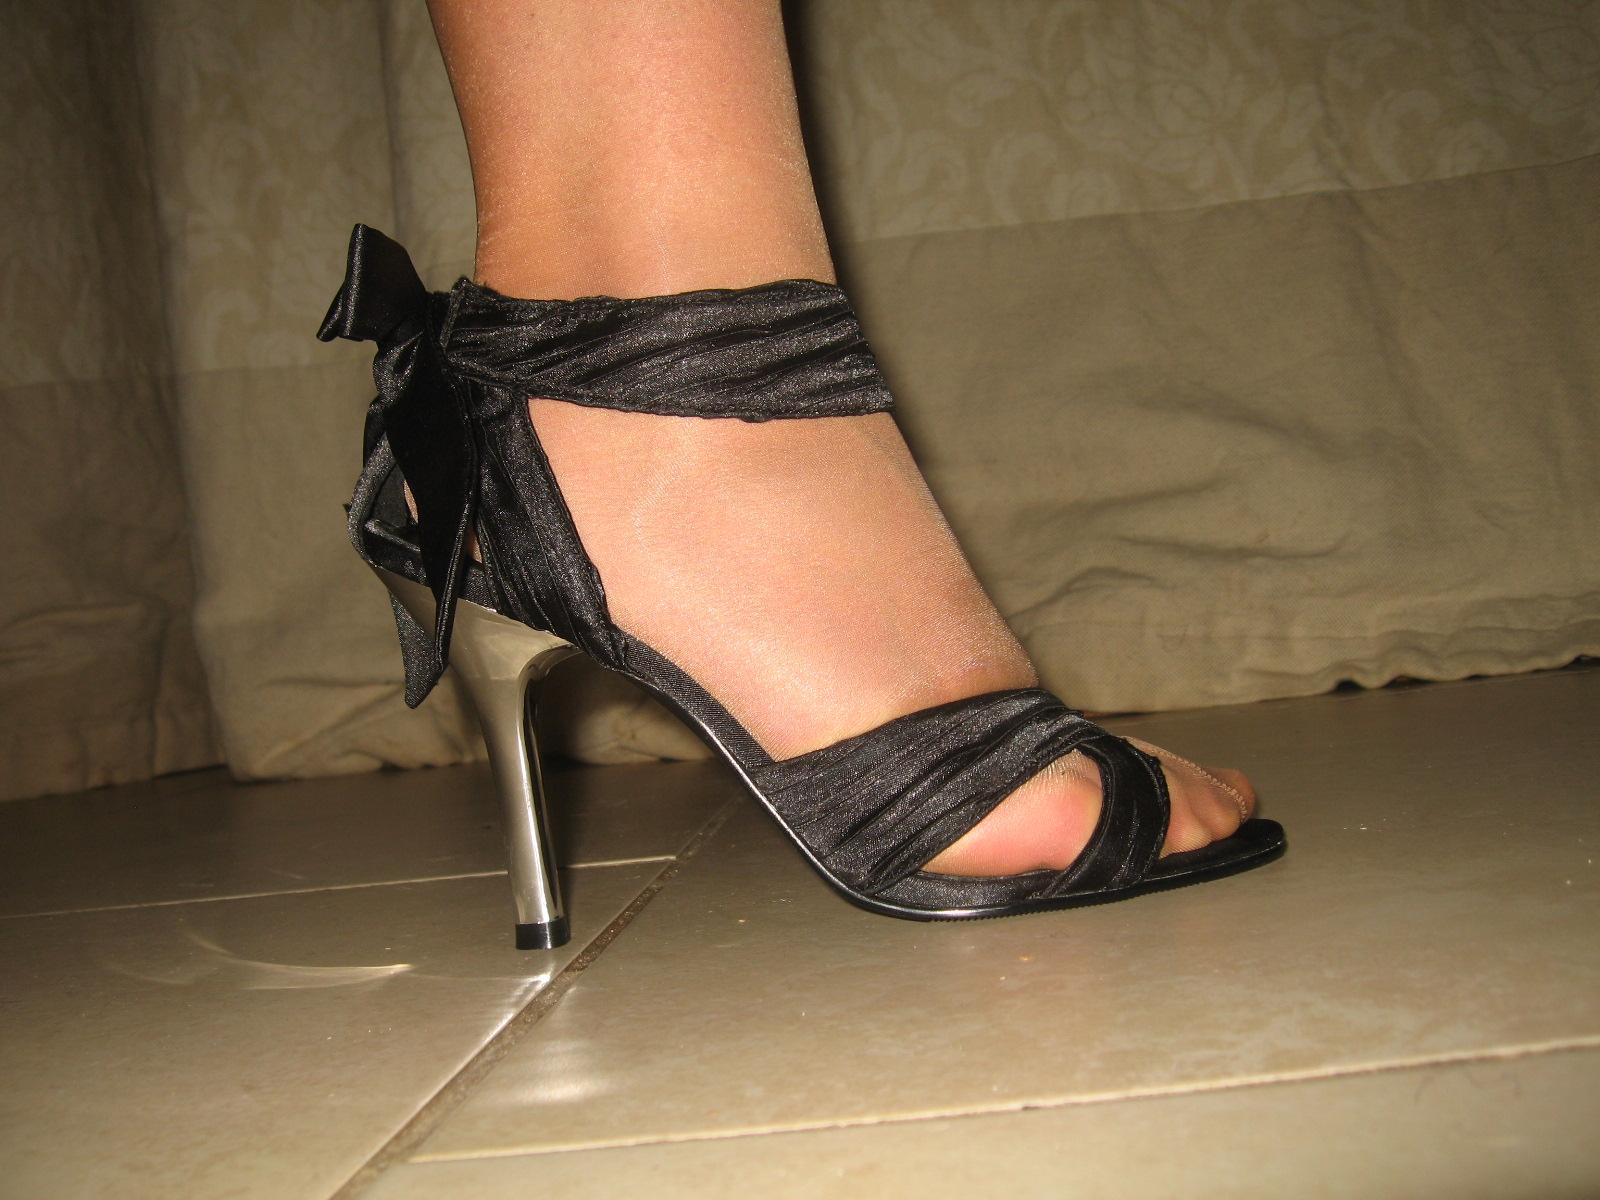 De Le Vide Taille Dressing New Look 39 Sandales Chez 32 Euros gawRp